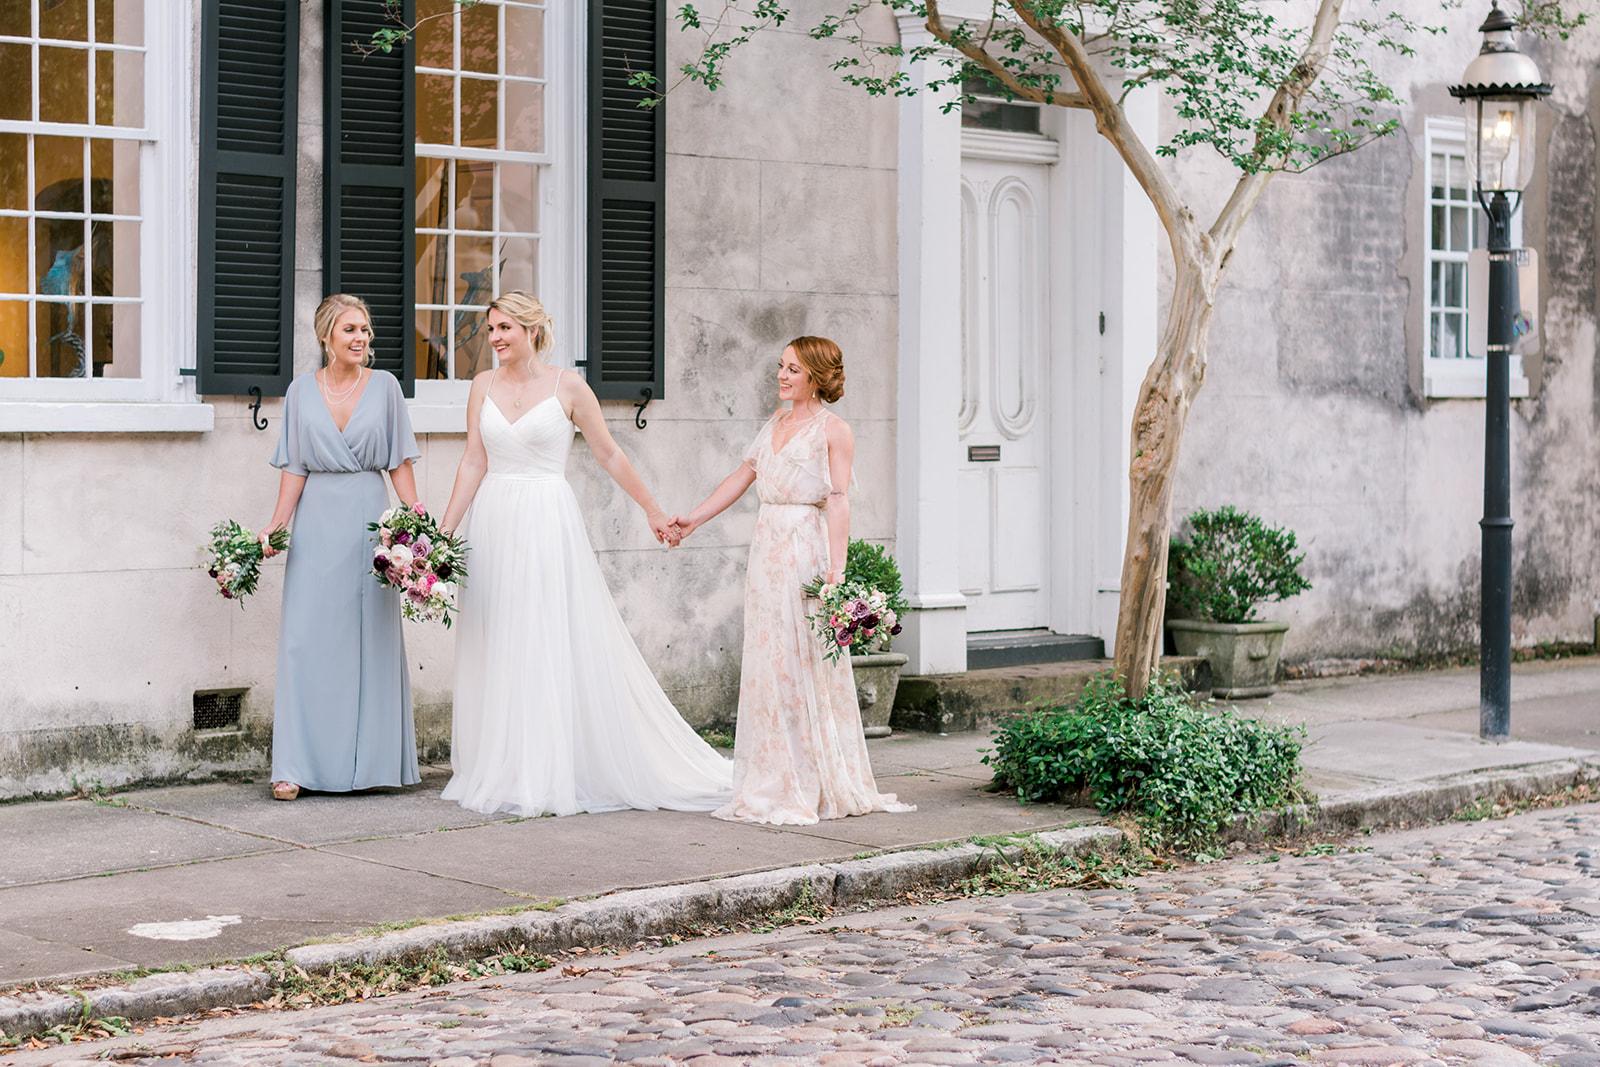 jenny-yoo-floral-print-bridesmaids-dresses-savannah-bridesmaids-dresses-savannah-bridal-shop-ivory-and-beau-savannah-weddings-rebecca-ingram-wedding-dress-affordable-wedding-dress-savannah-bridal-shop-ivory-and-beau-health-coach.jpg